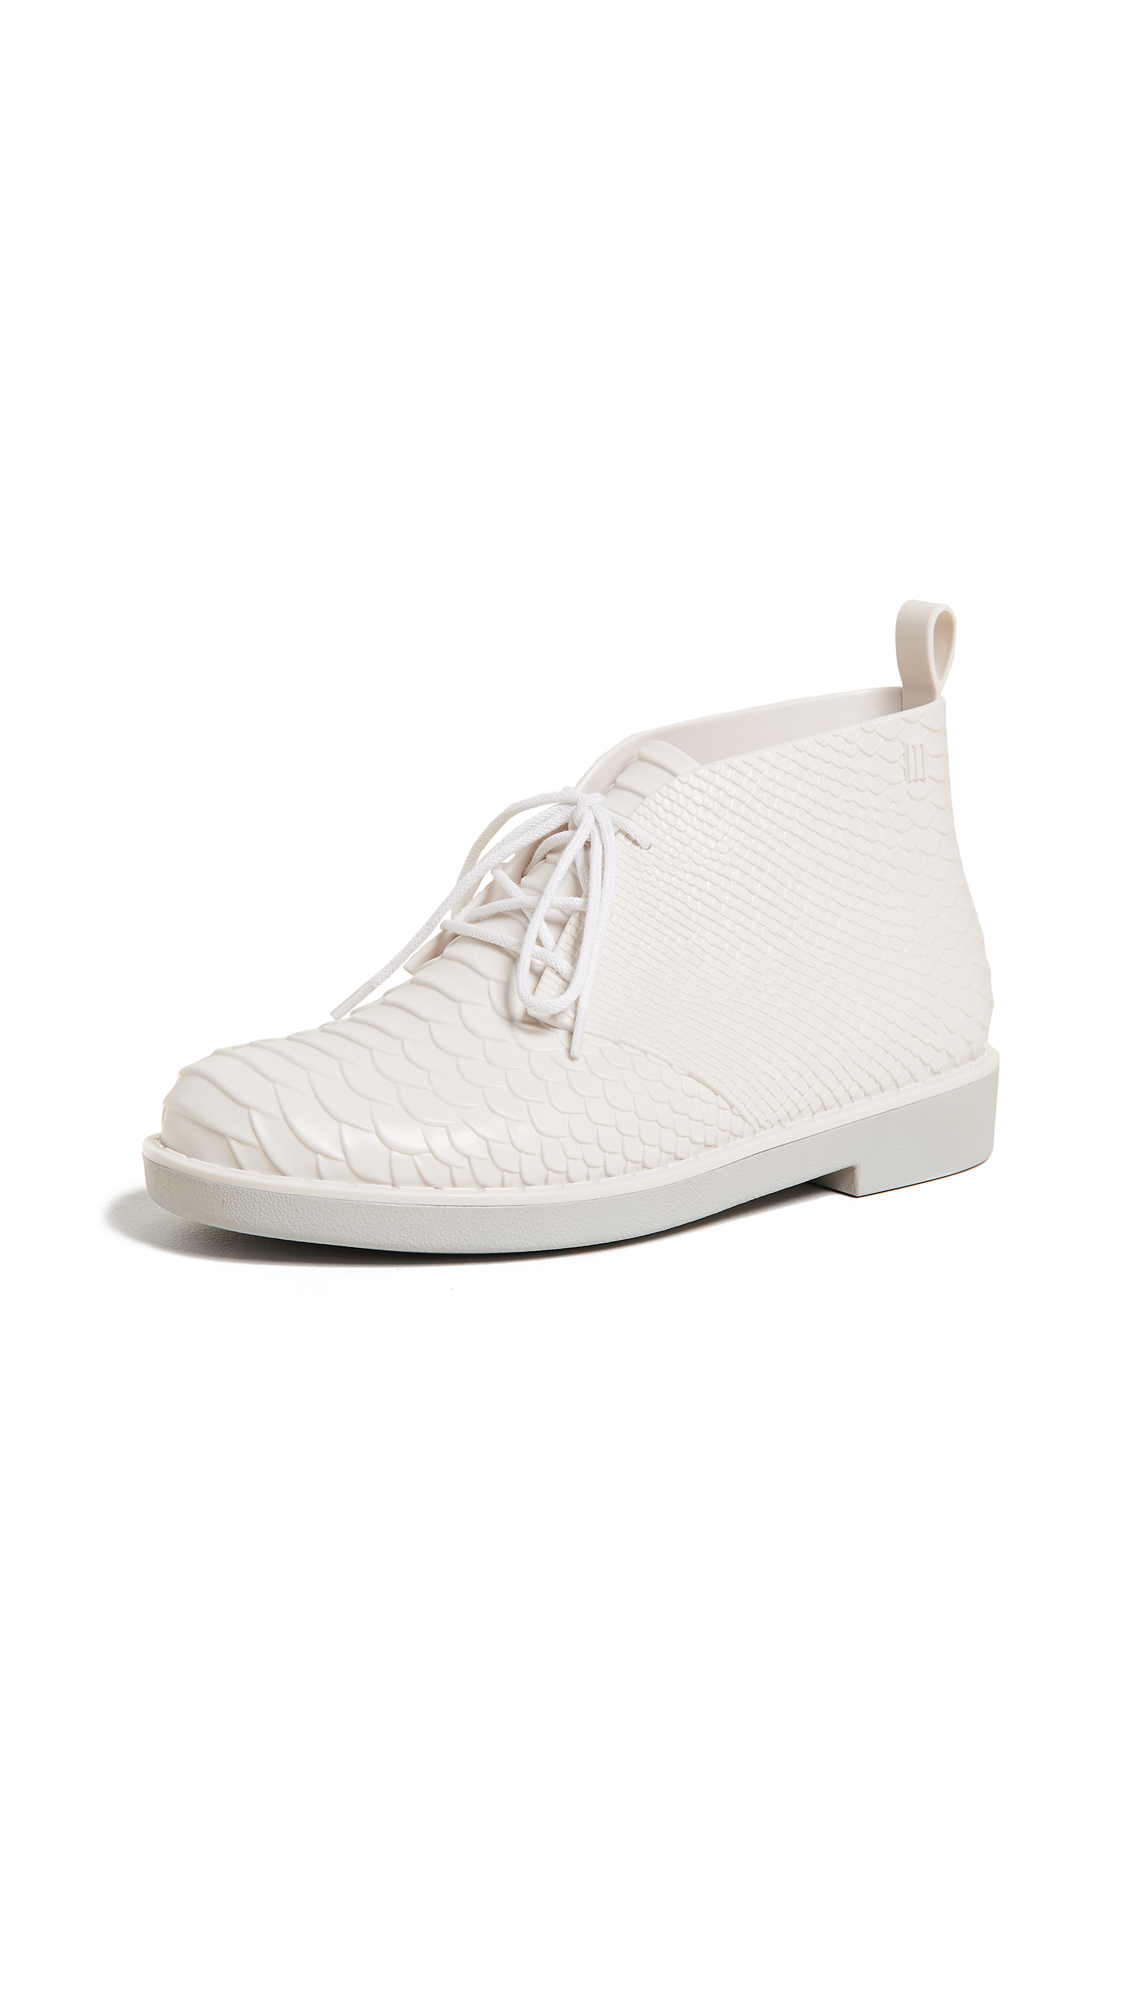 Melissa x Baja East Desert Boots - Grey White